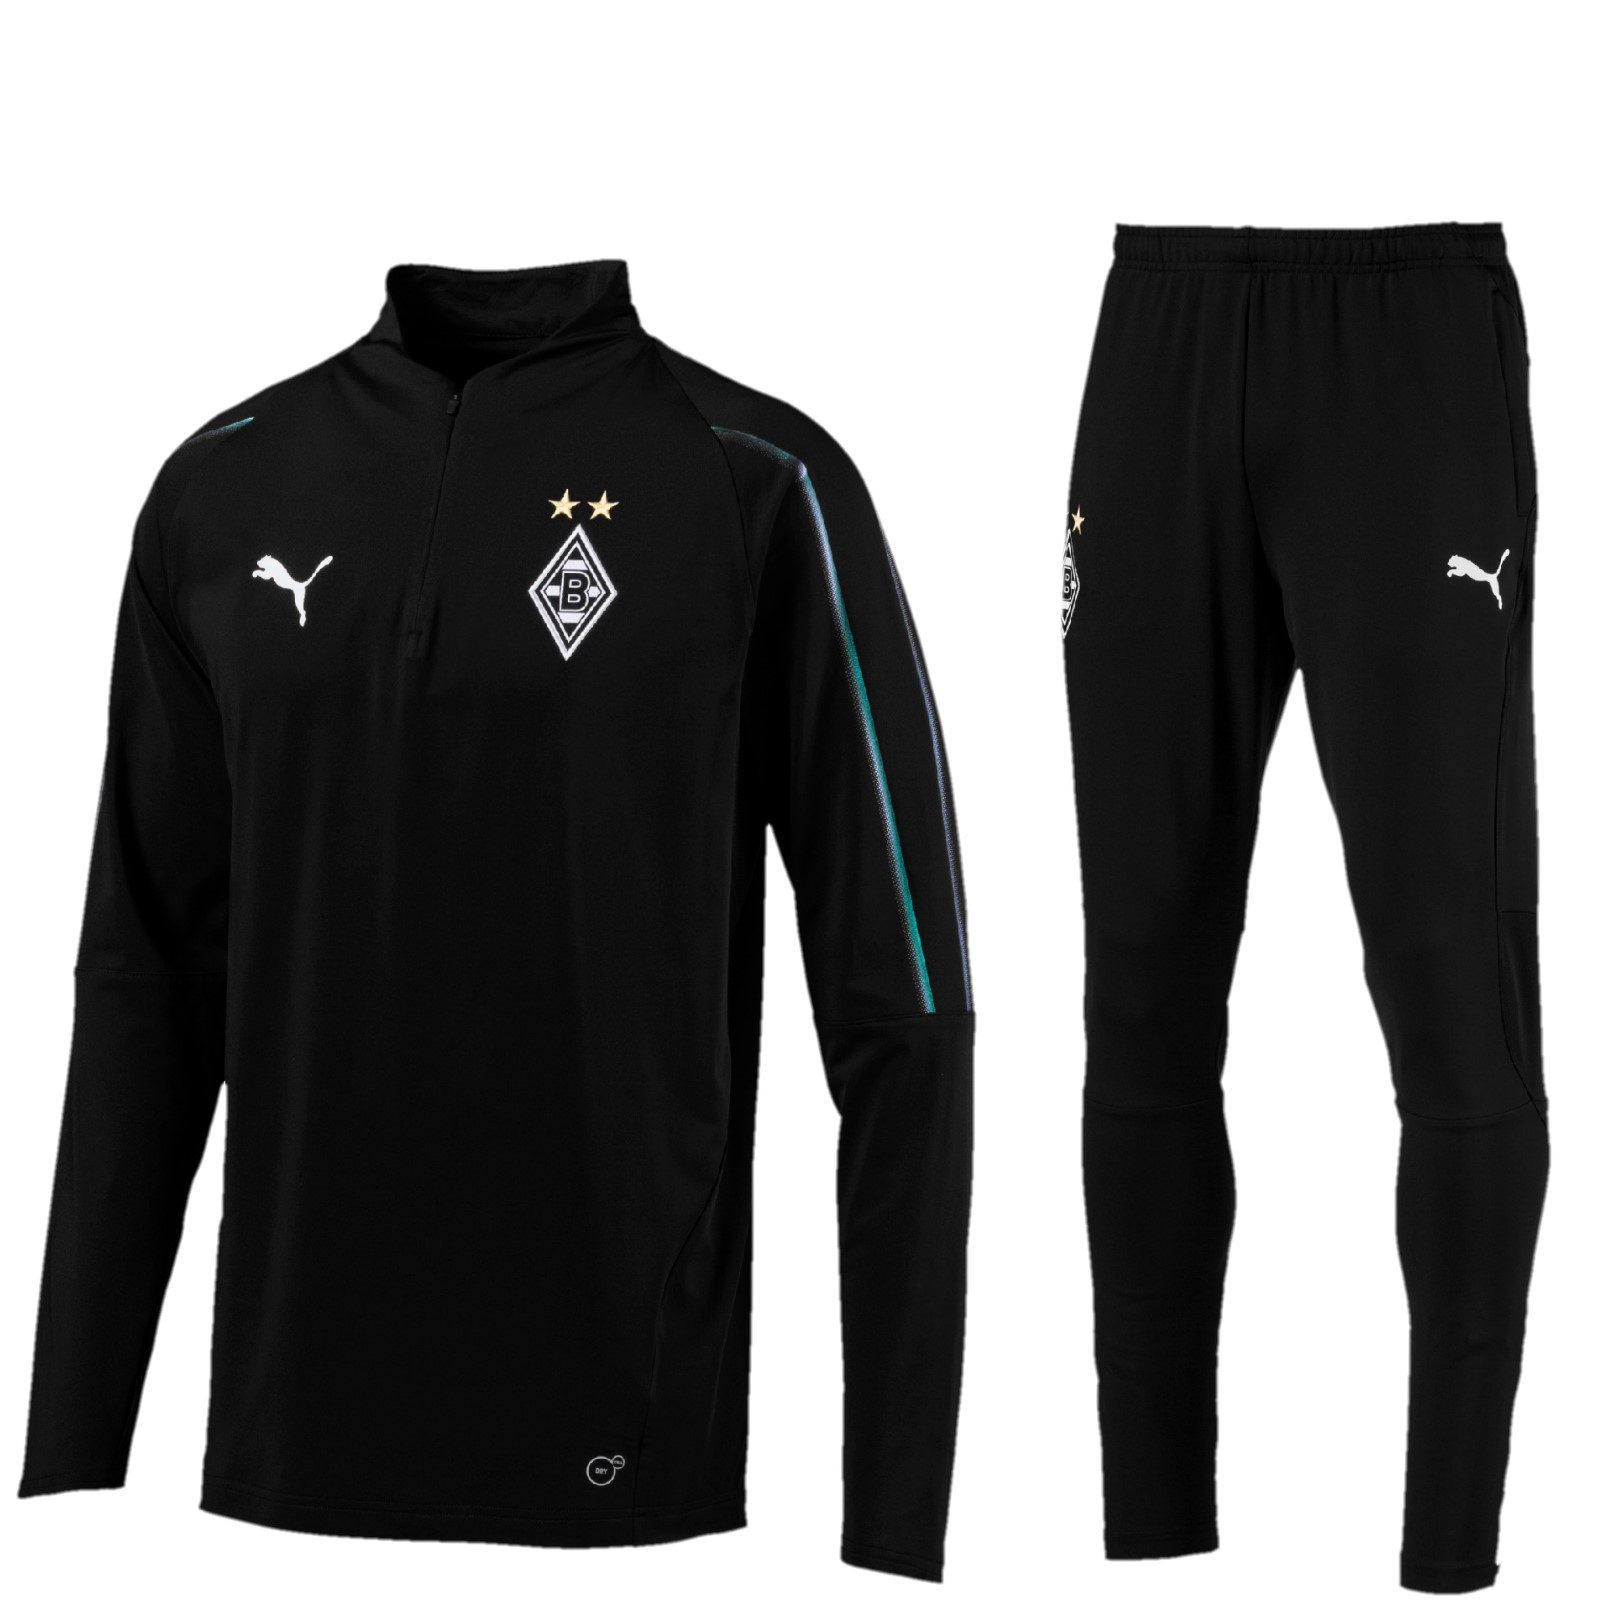 Borussia M/önchengladbach Herren Badehose Black /& White